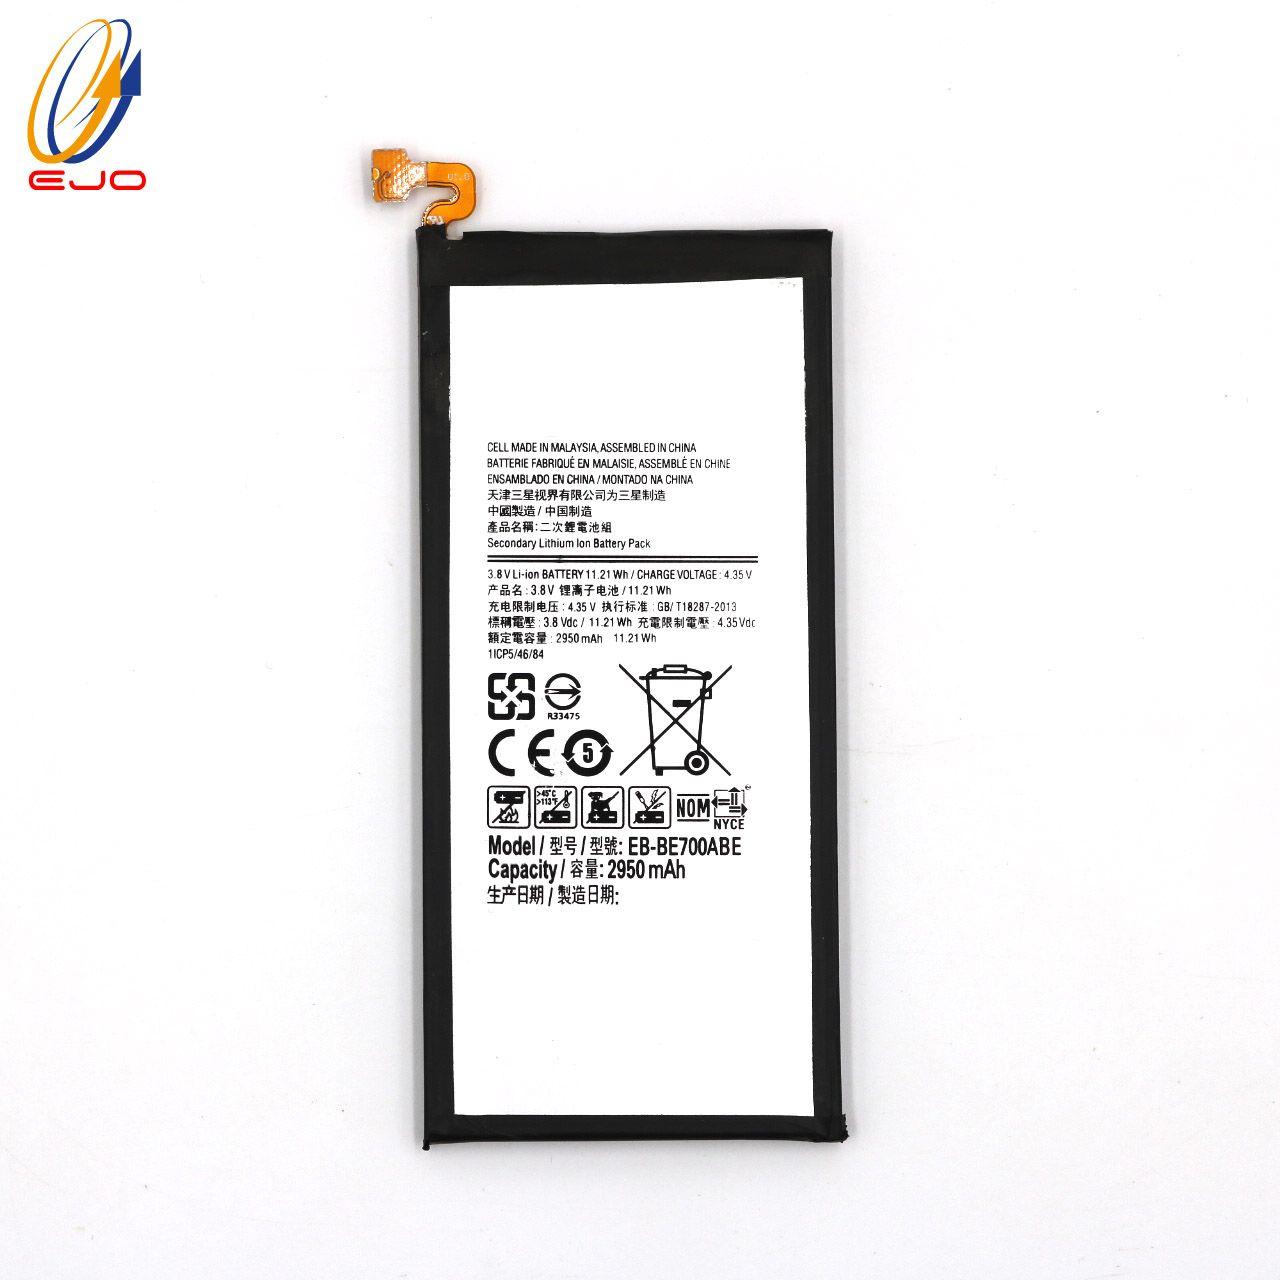 Samsung Galaxy için E7 Pil EB-BE700ABE 2950 mAh N920 Telefon batterie Samsung Galaxy E7 E700 Dahili Yedek Bateria Akku